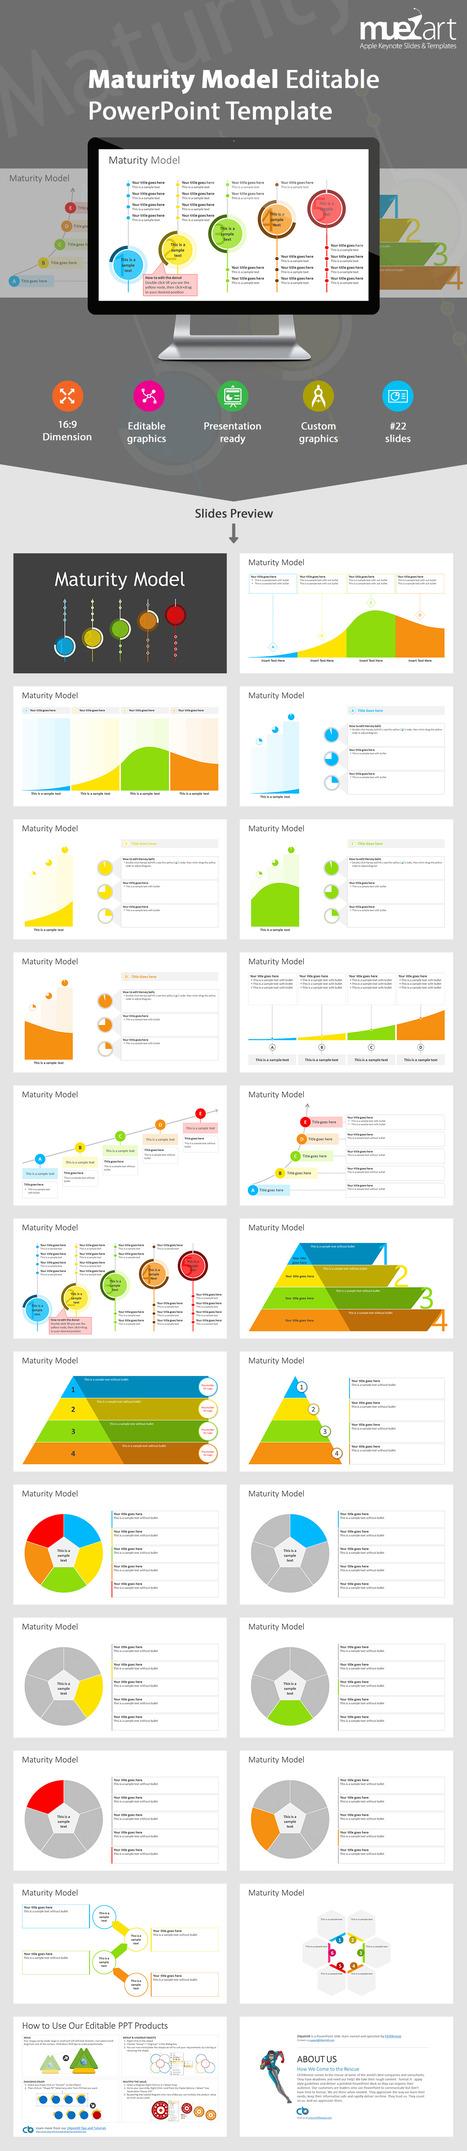 Capability Maturity Model Keynote Presentation | Apple Keynote Slides For Sale | Scoop.it